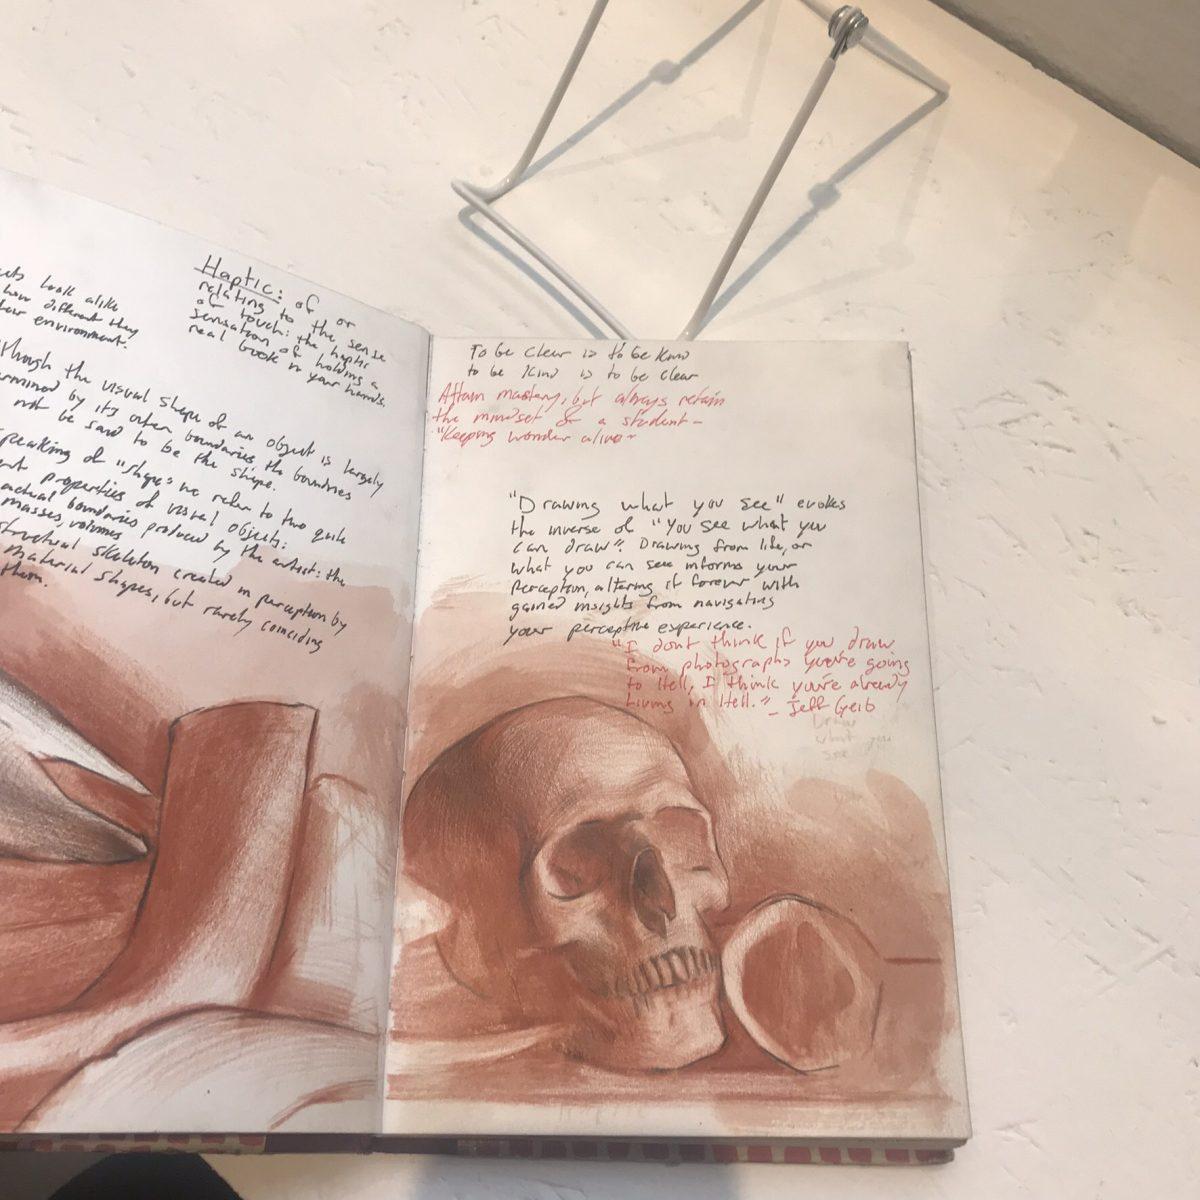 Sketchbook page by Evan Kitson. (Milene Fernandez/The Epoch Times)